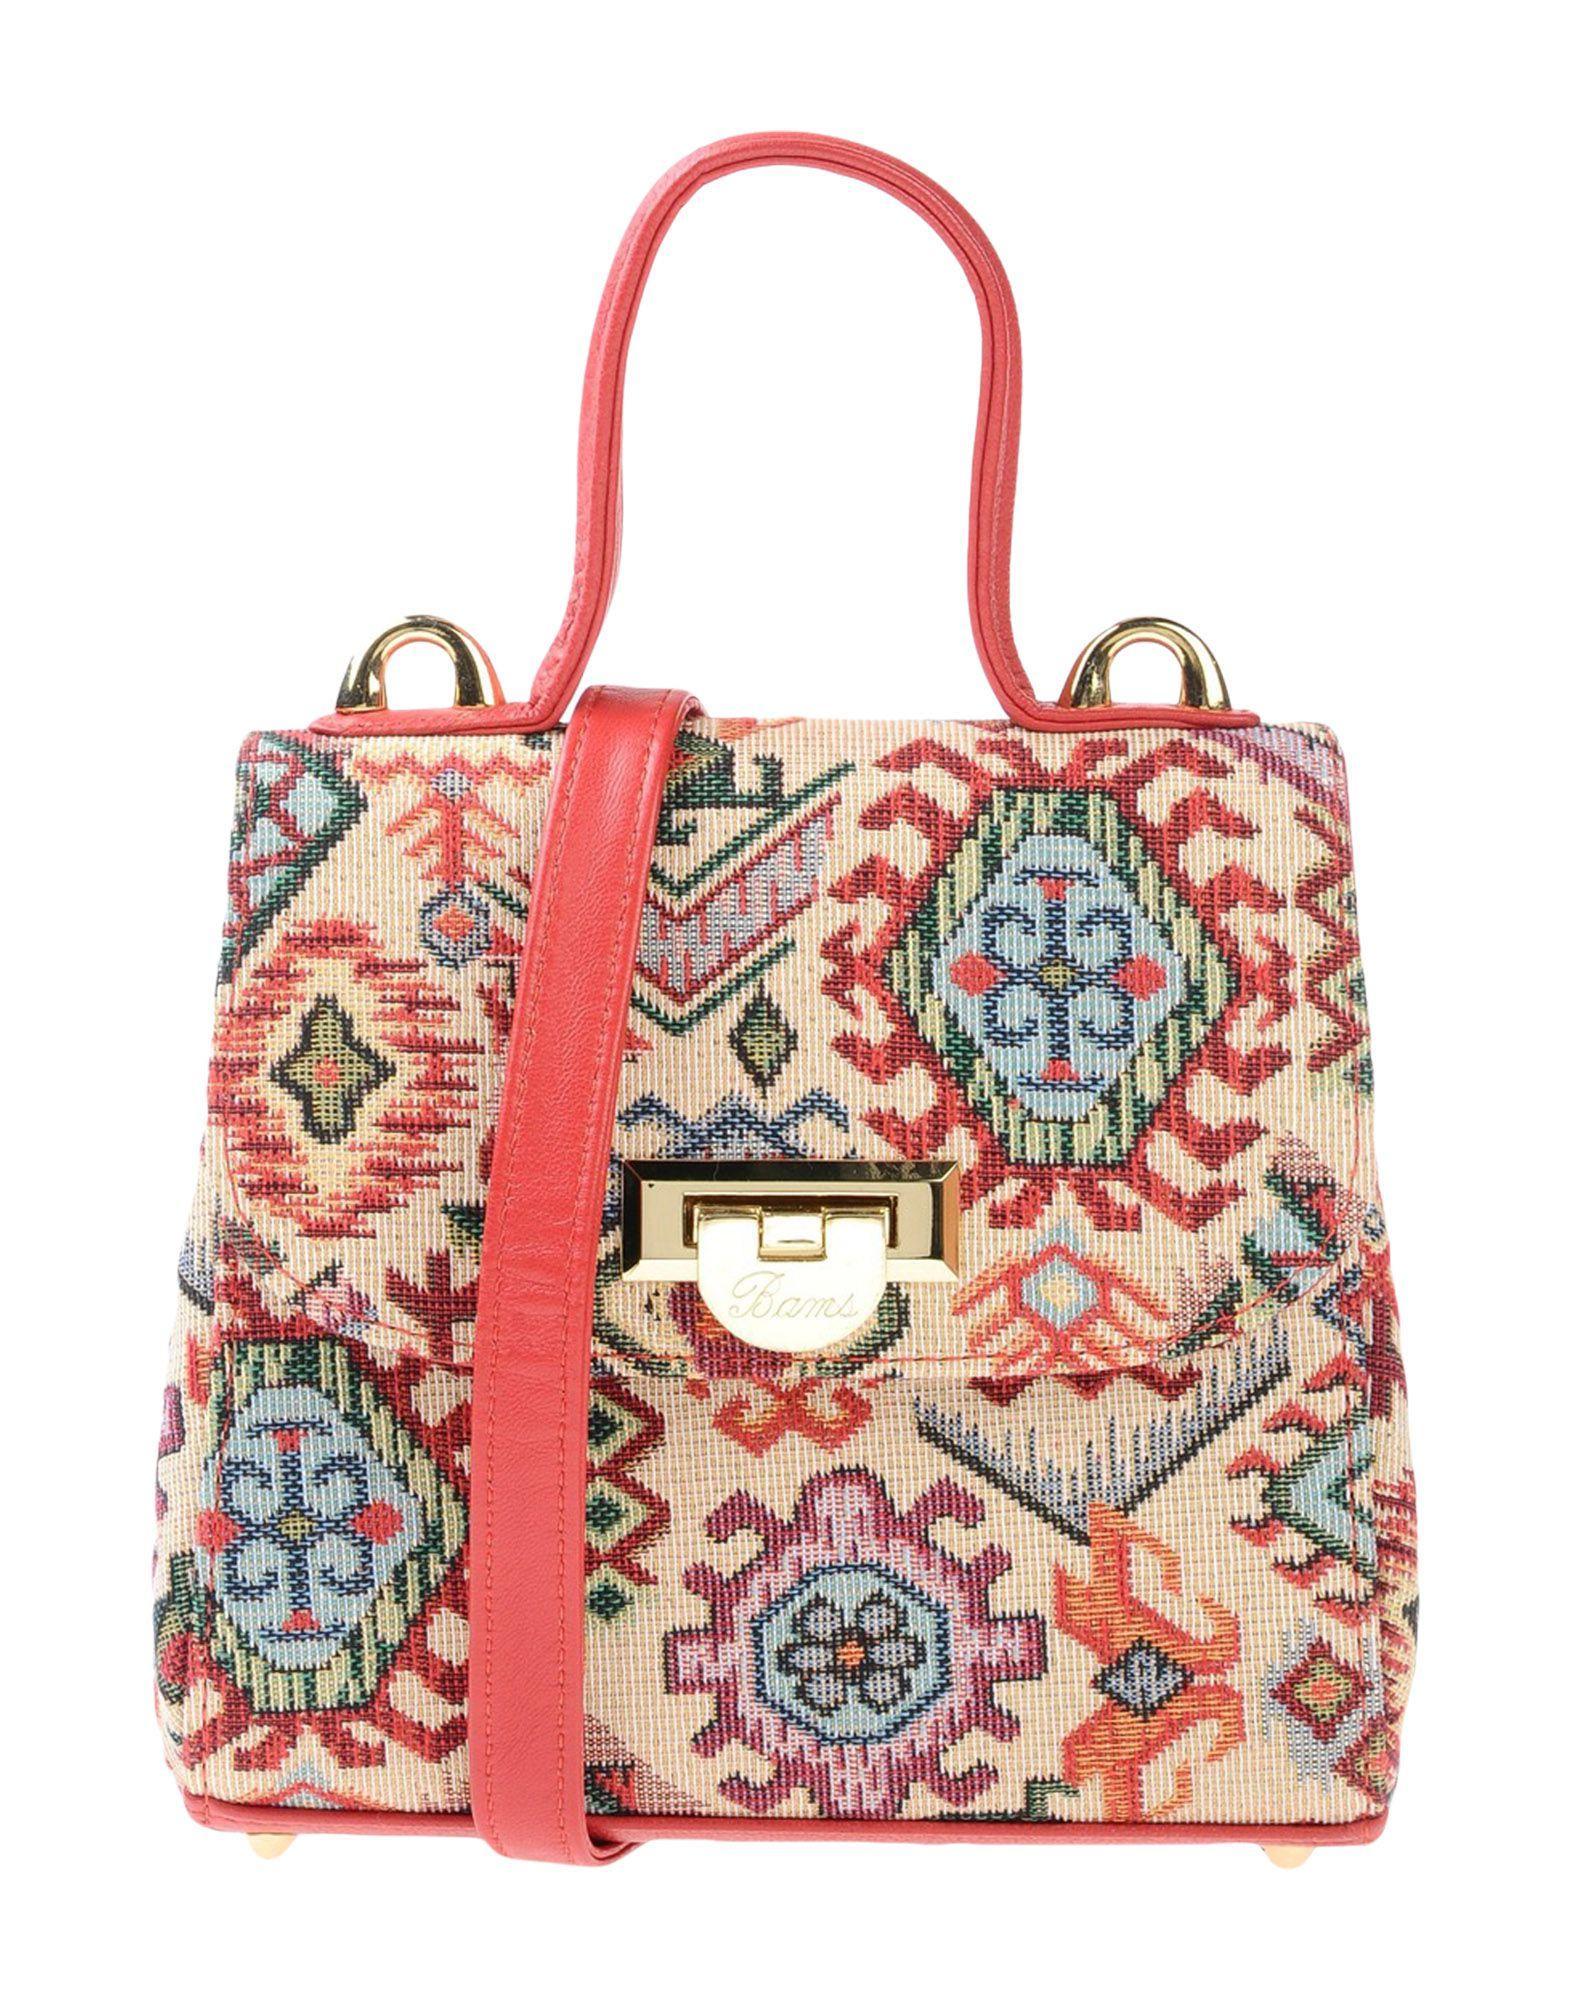 Bams Handbags In Beige